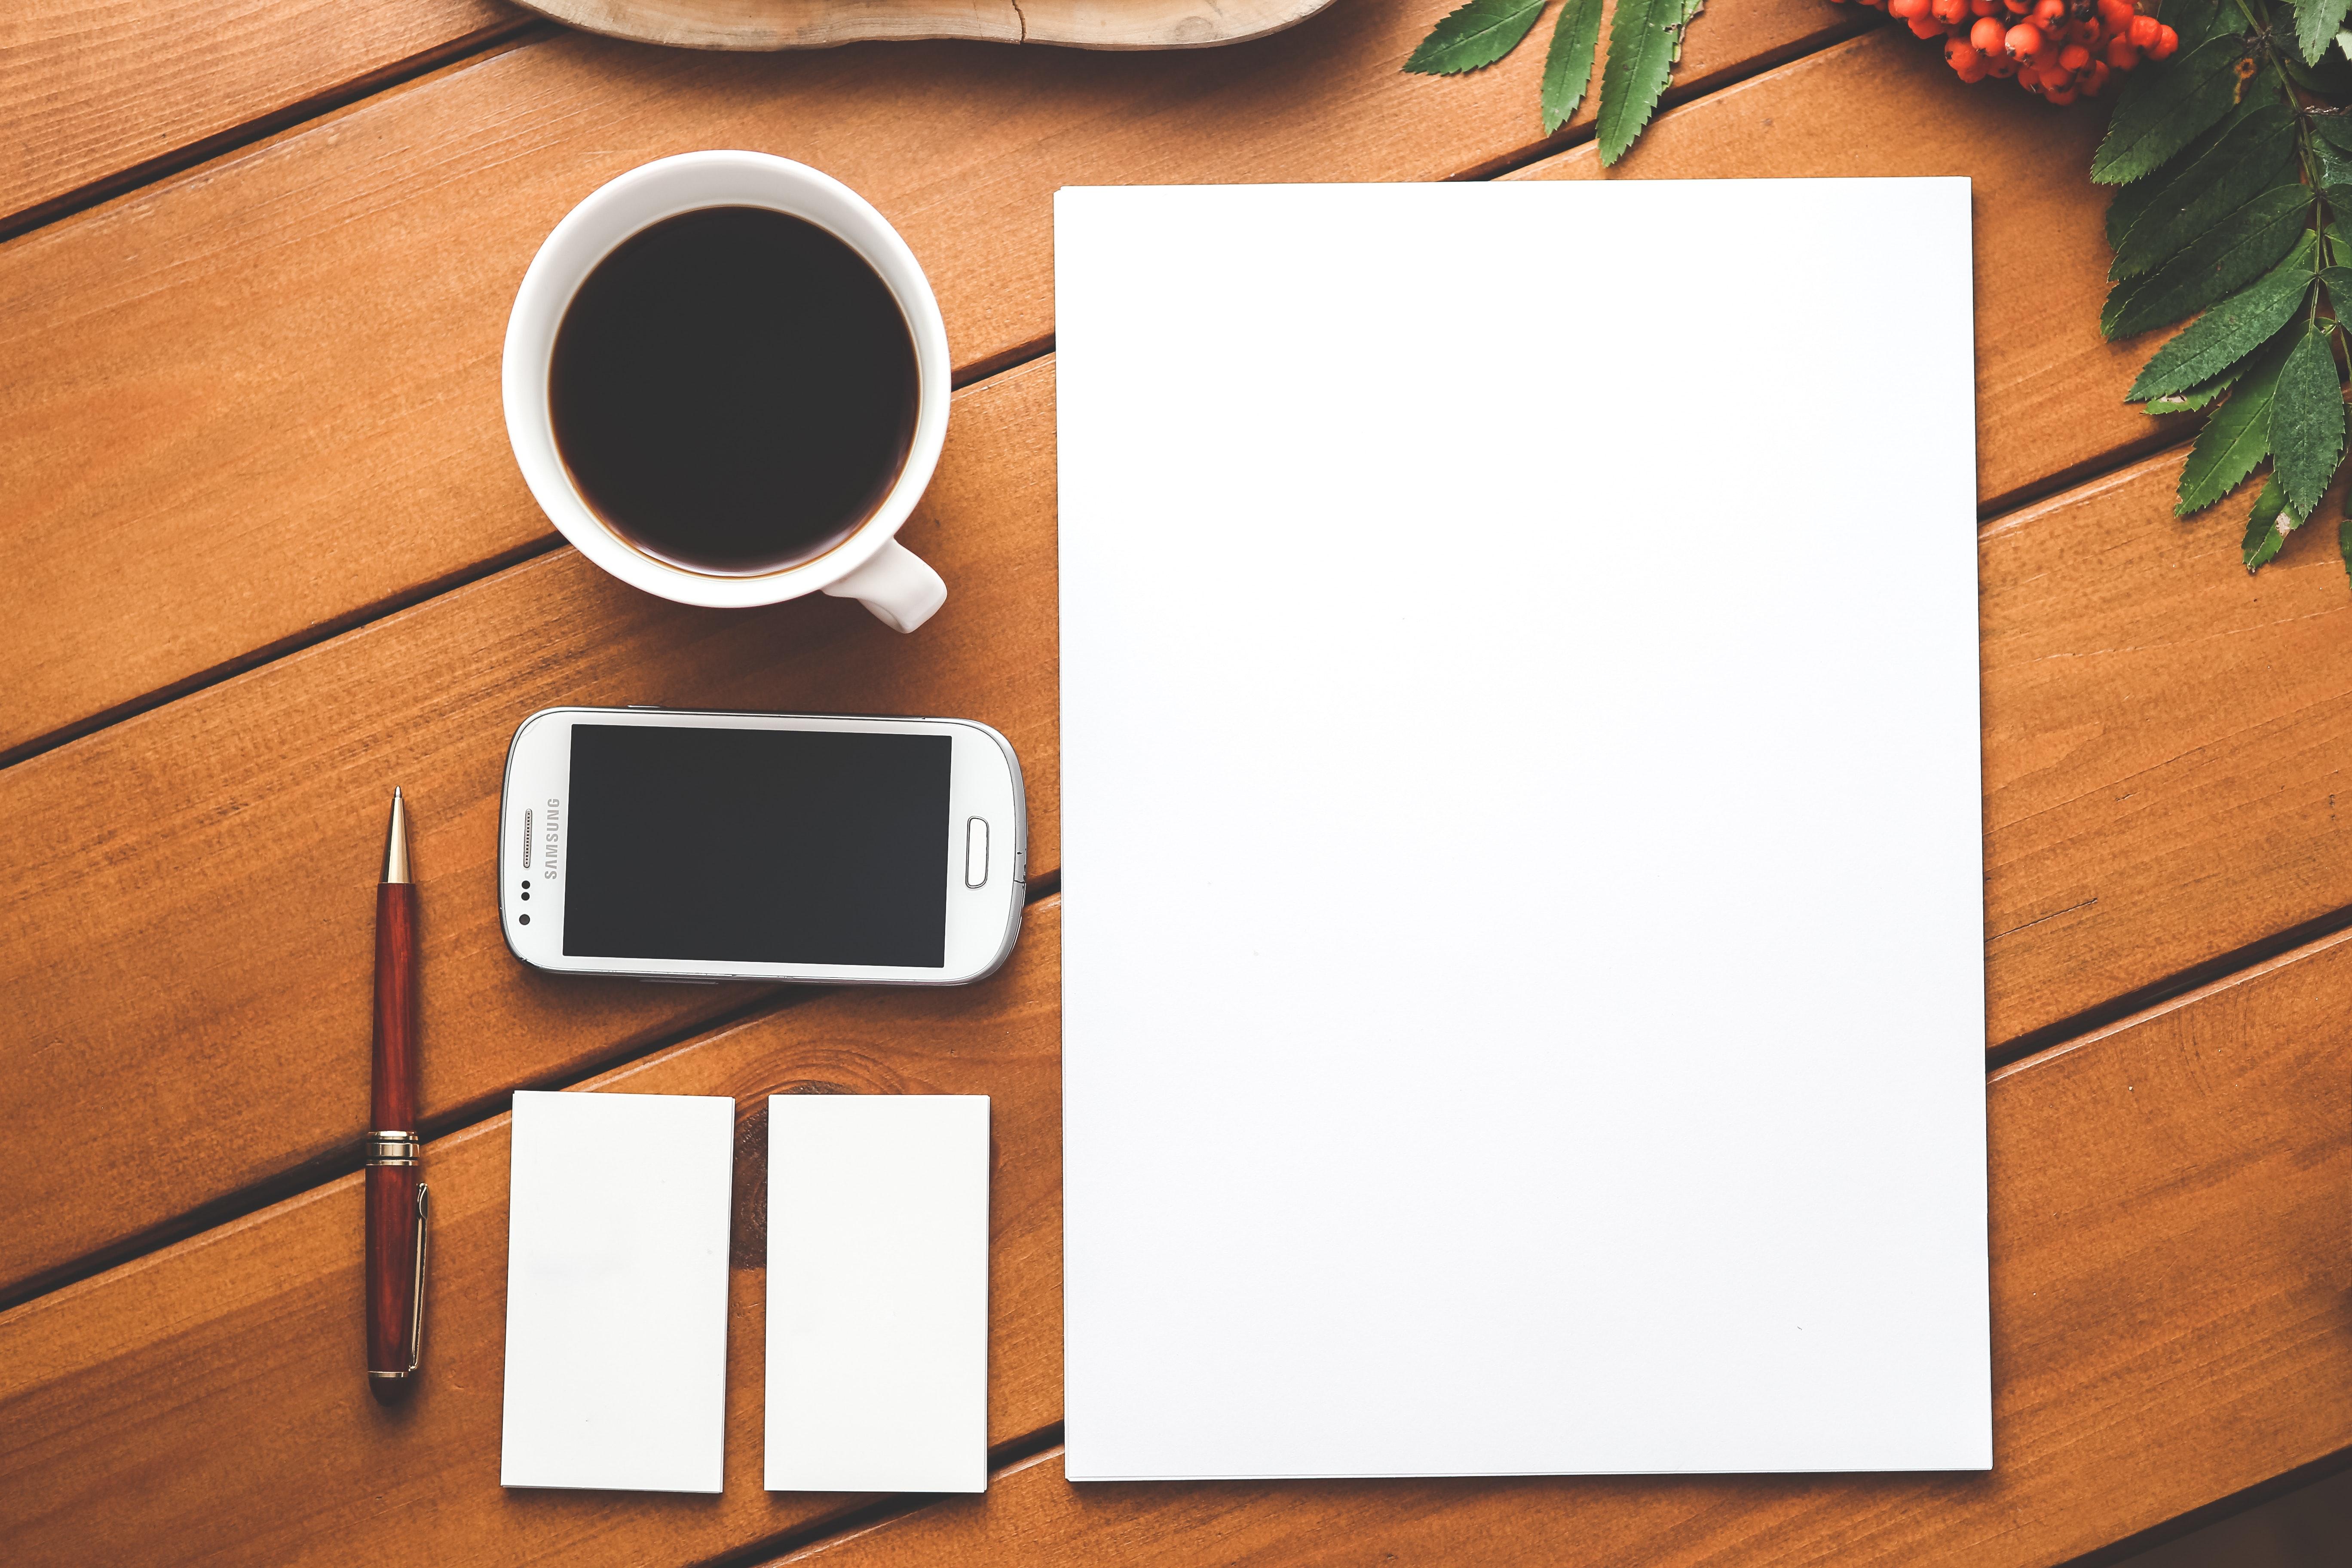 blank-branding-identity-business-6372